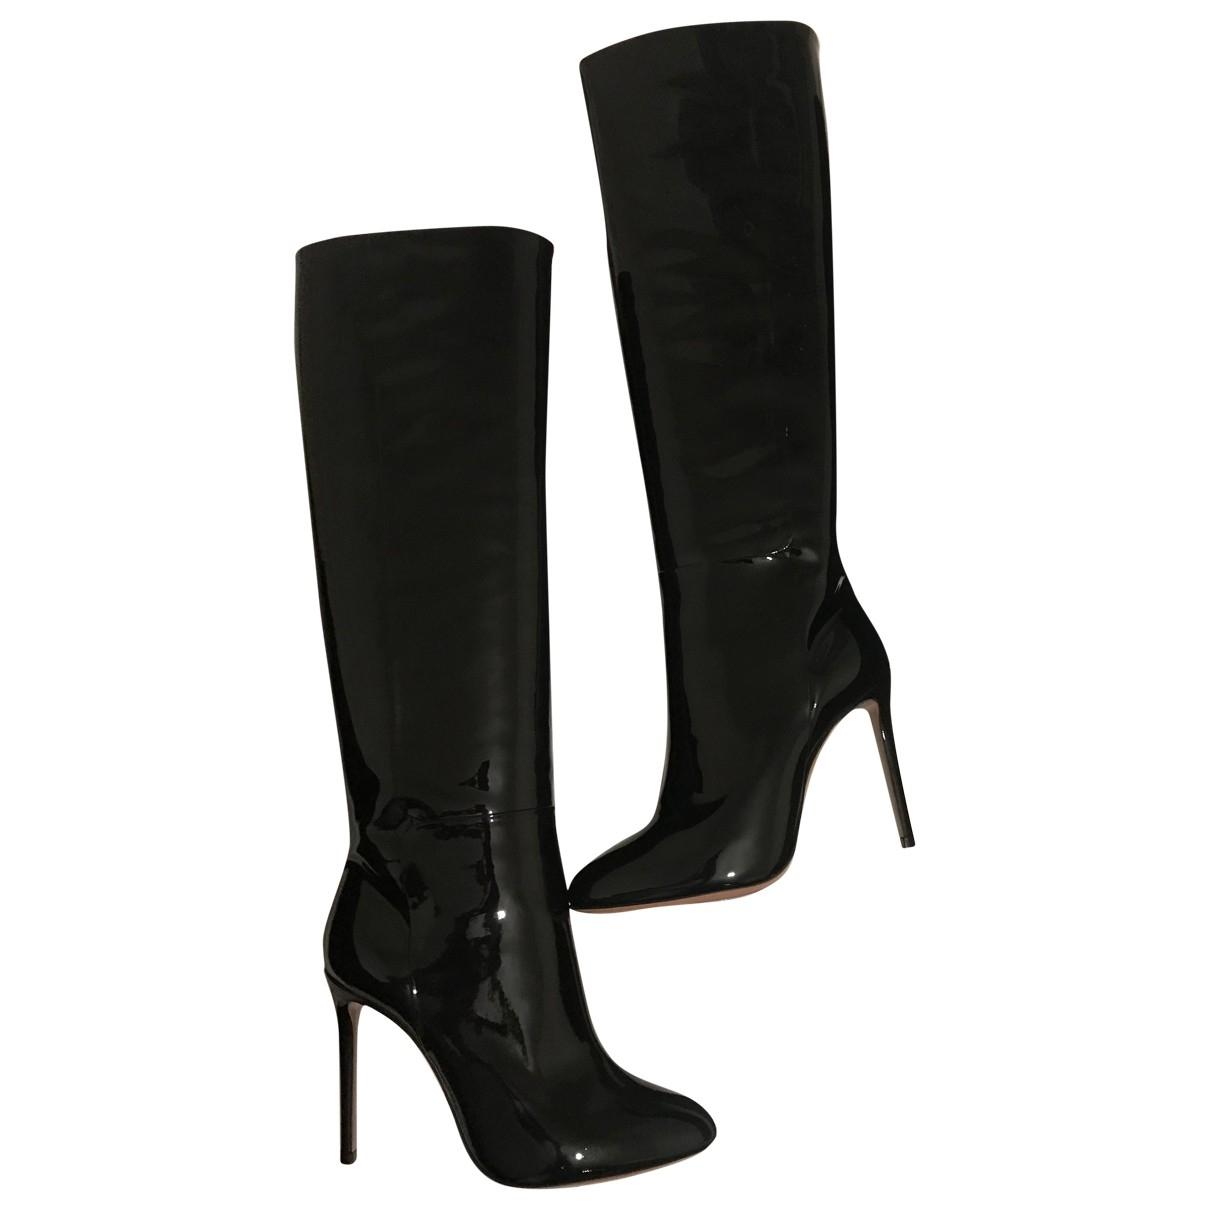 Aquazzura \N Black Patent leather Boots for Women 36.5 EU